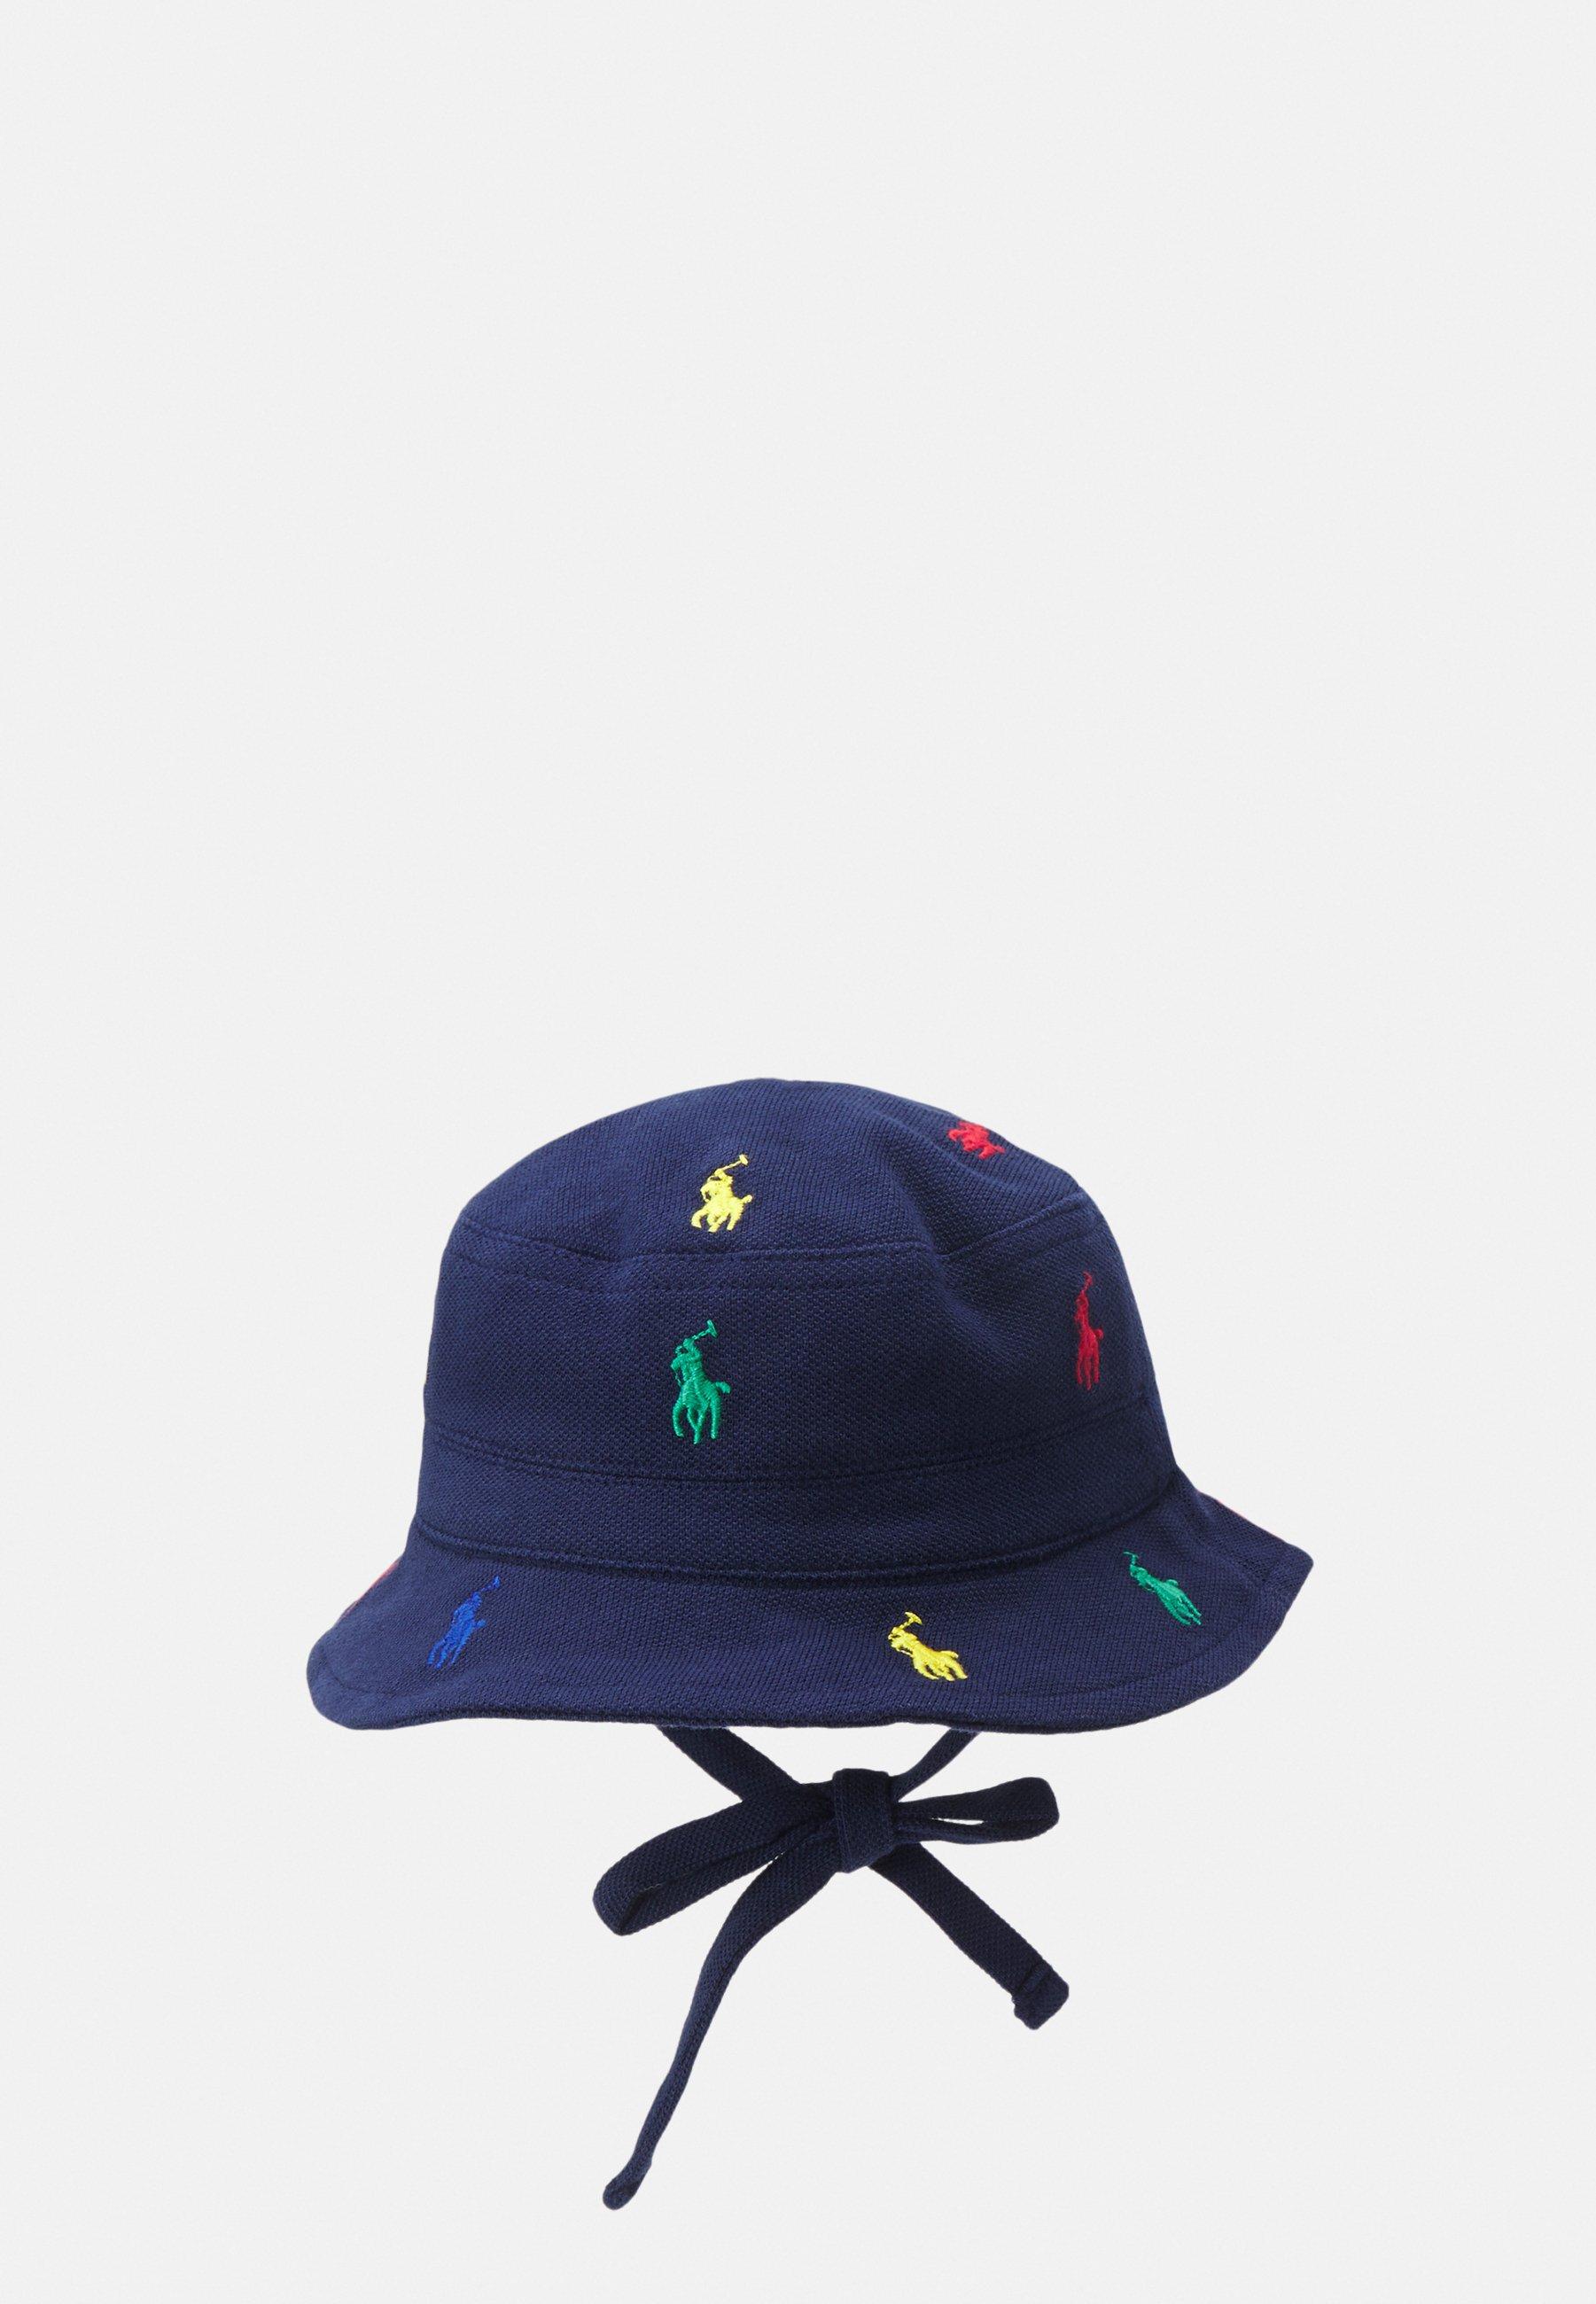 Kinder BUCKET HAT HEADWEAR UNISEX - Hut